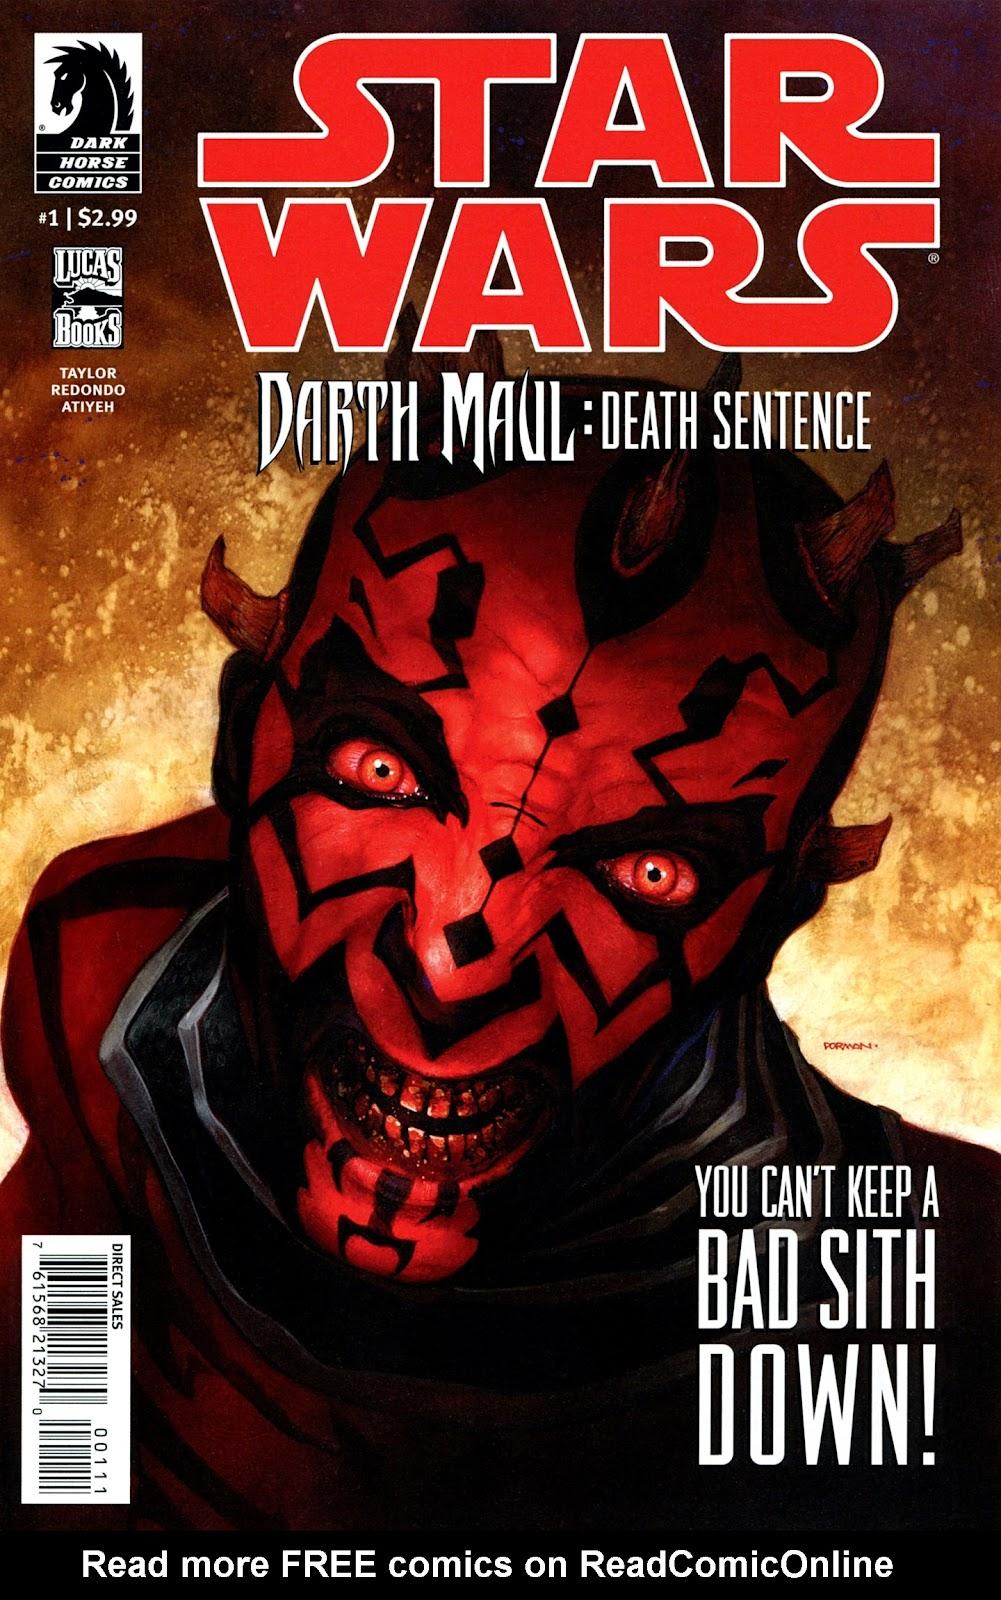 Star Wars: Darth Maul - Death Sentence 1 Page 1